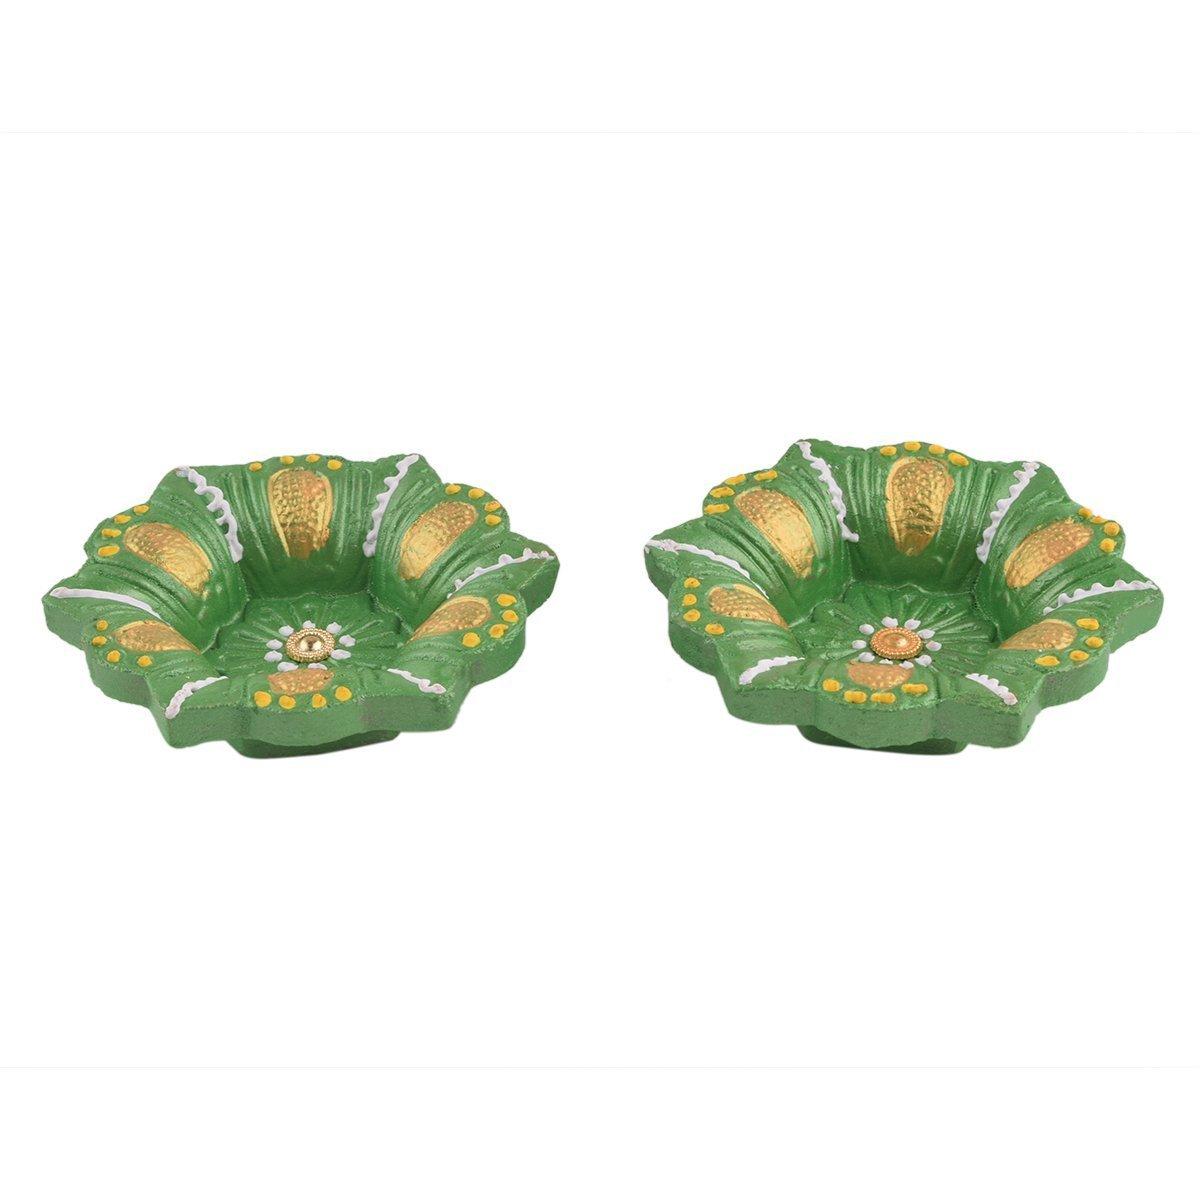 Store Indya, Diya Set Of 2 Handmade Clay Earthen Terracotta Diwali Diyas Lamps For Deepwali Door Pooja Festive Decorations storeindya